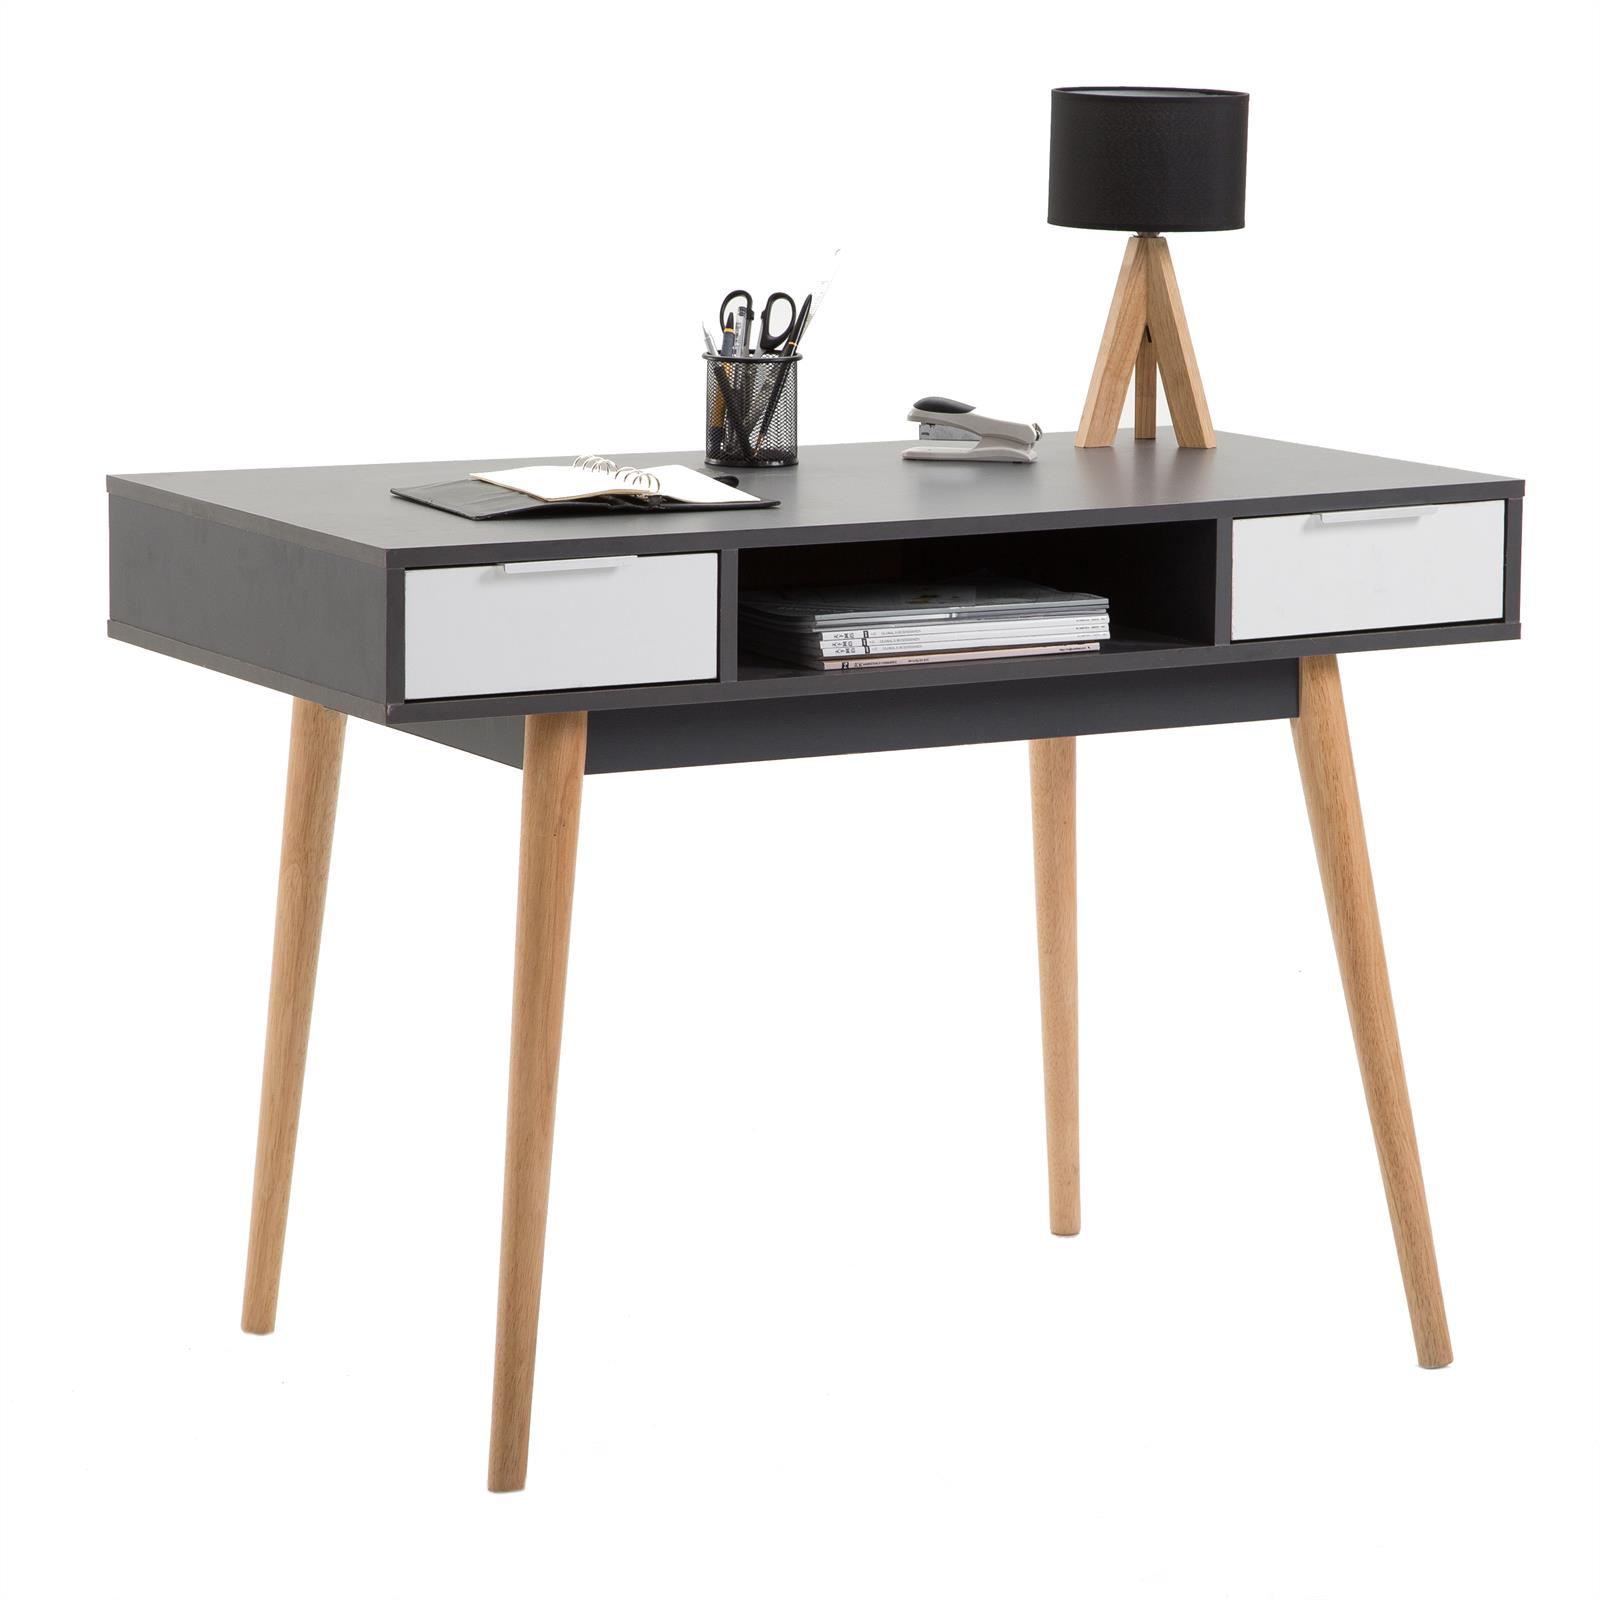 b ware konsolentisch sekret r newport grau wei mobilia24. Black Bedroom Furniture Sets. Home Design Ideas